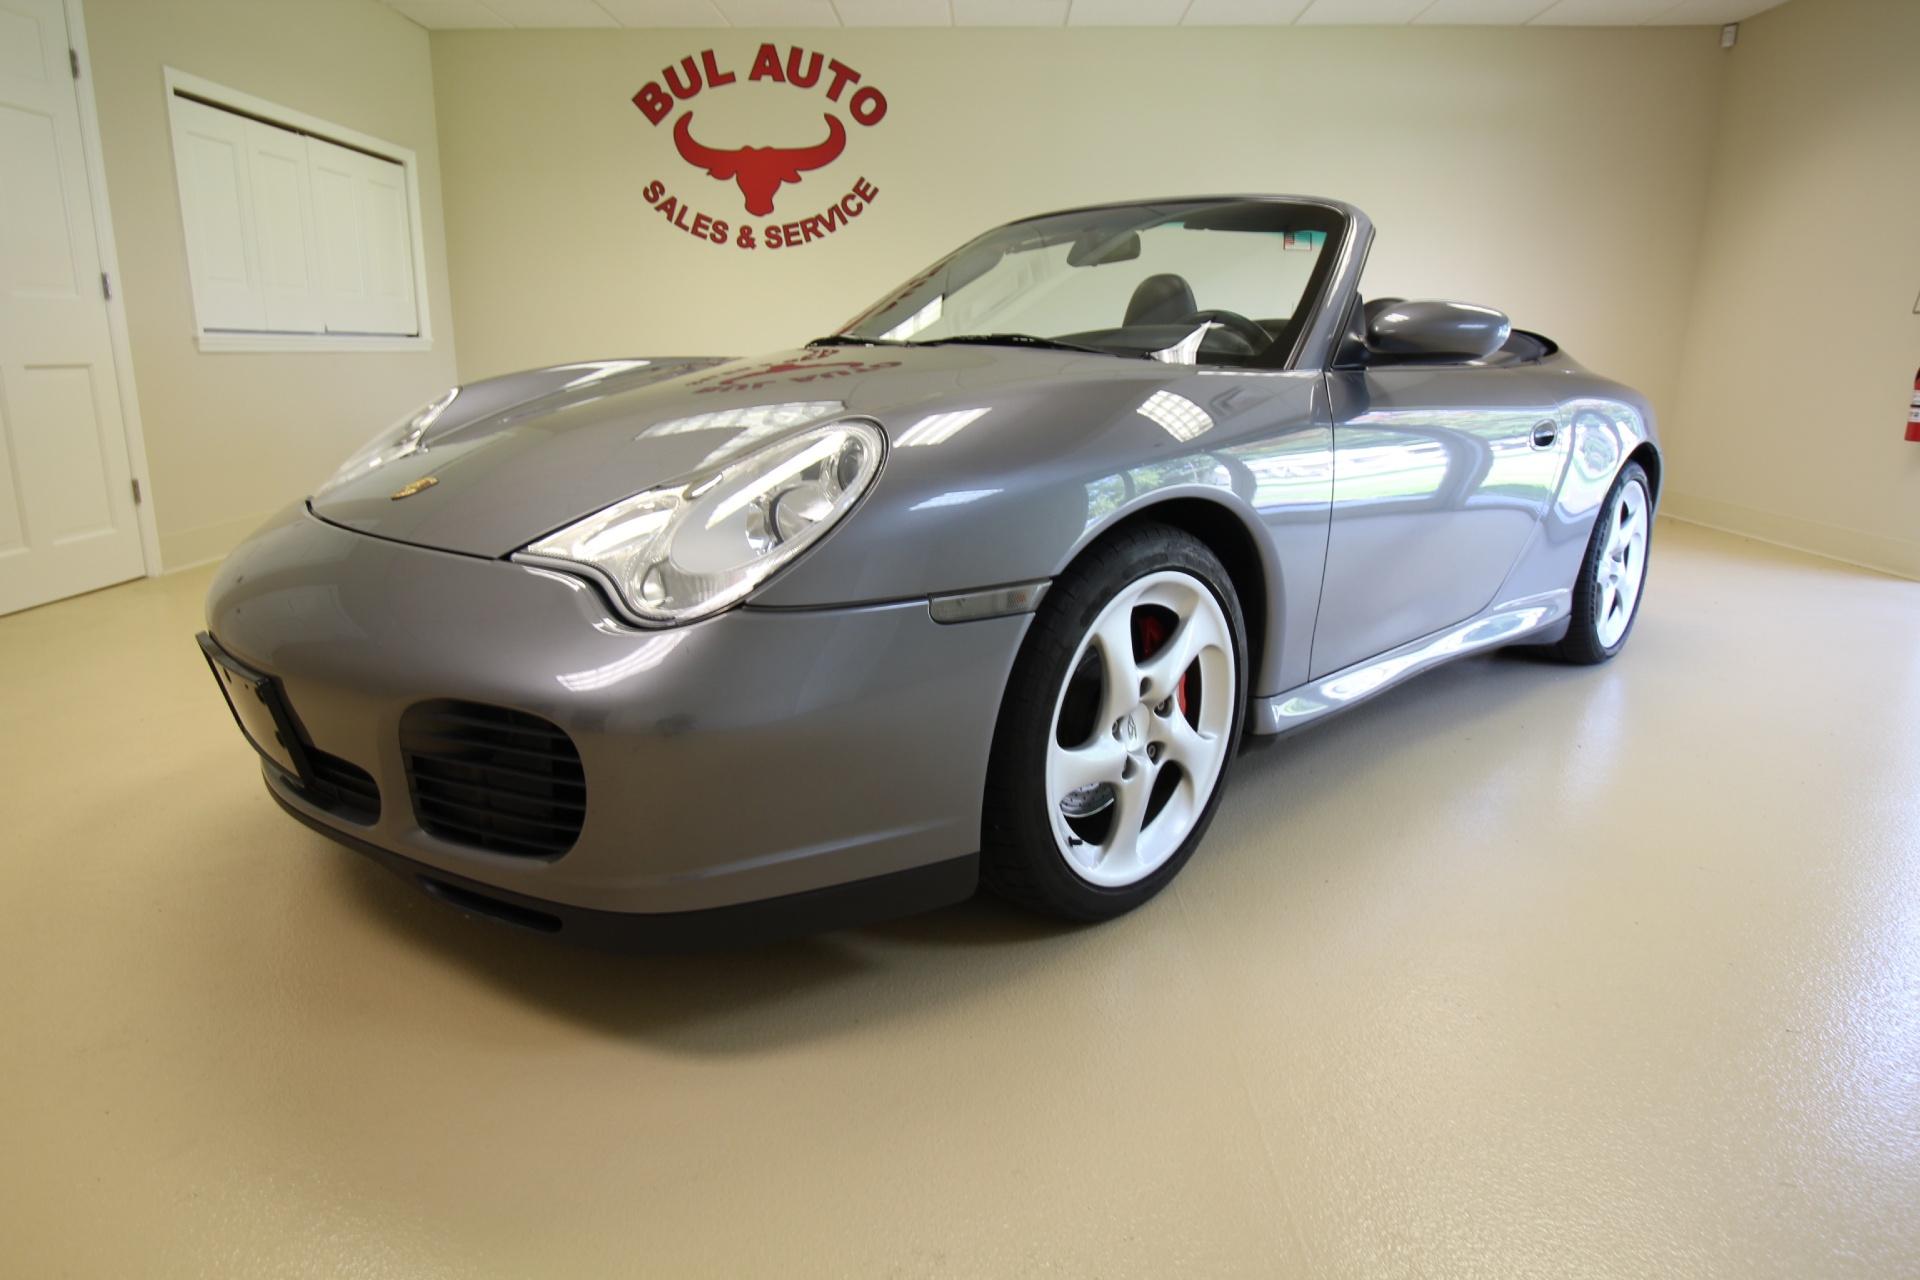 2004 porsche 911 carrera 4s cabriolet stock 16242 for. Black Bedroom Furniture Sets. Home Design Ideas